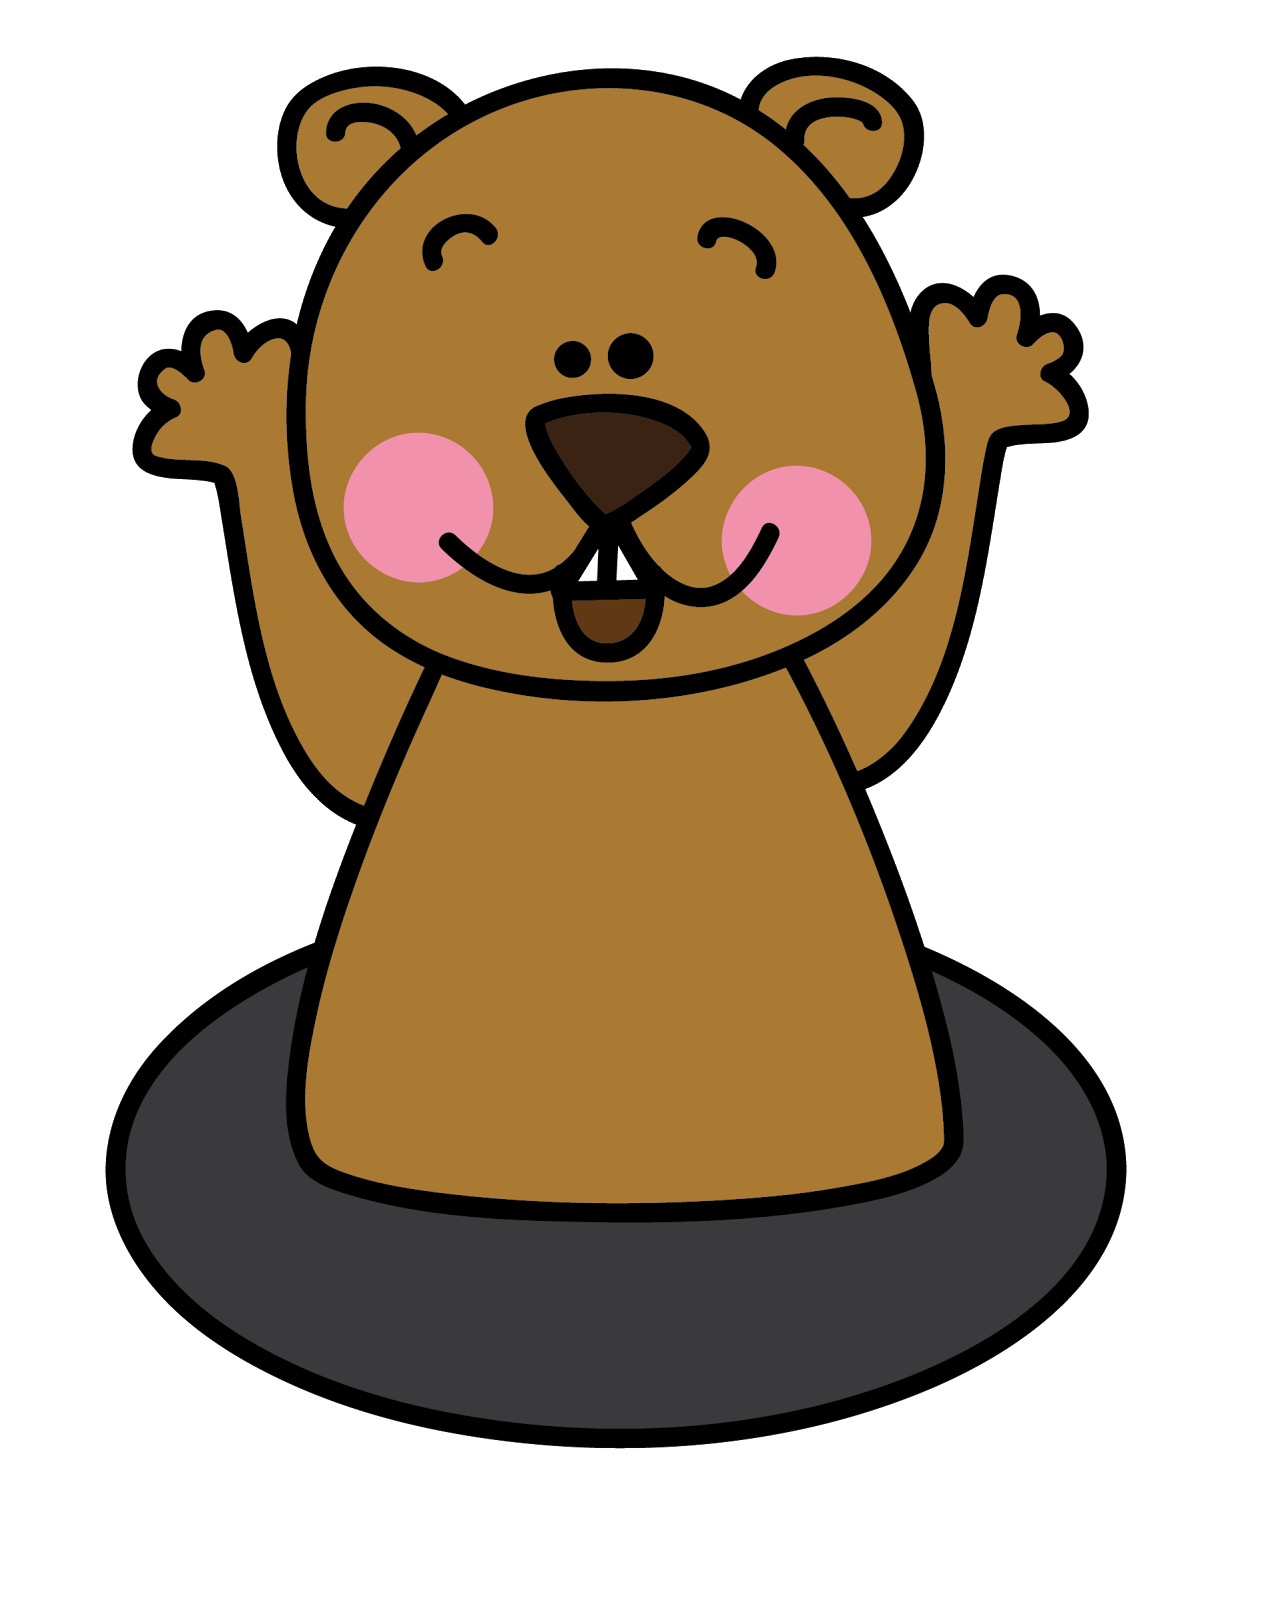 Free Groundhog Clipart-Free Groundhog Clipart-4